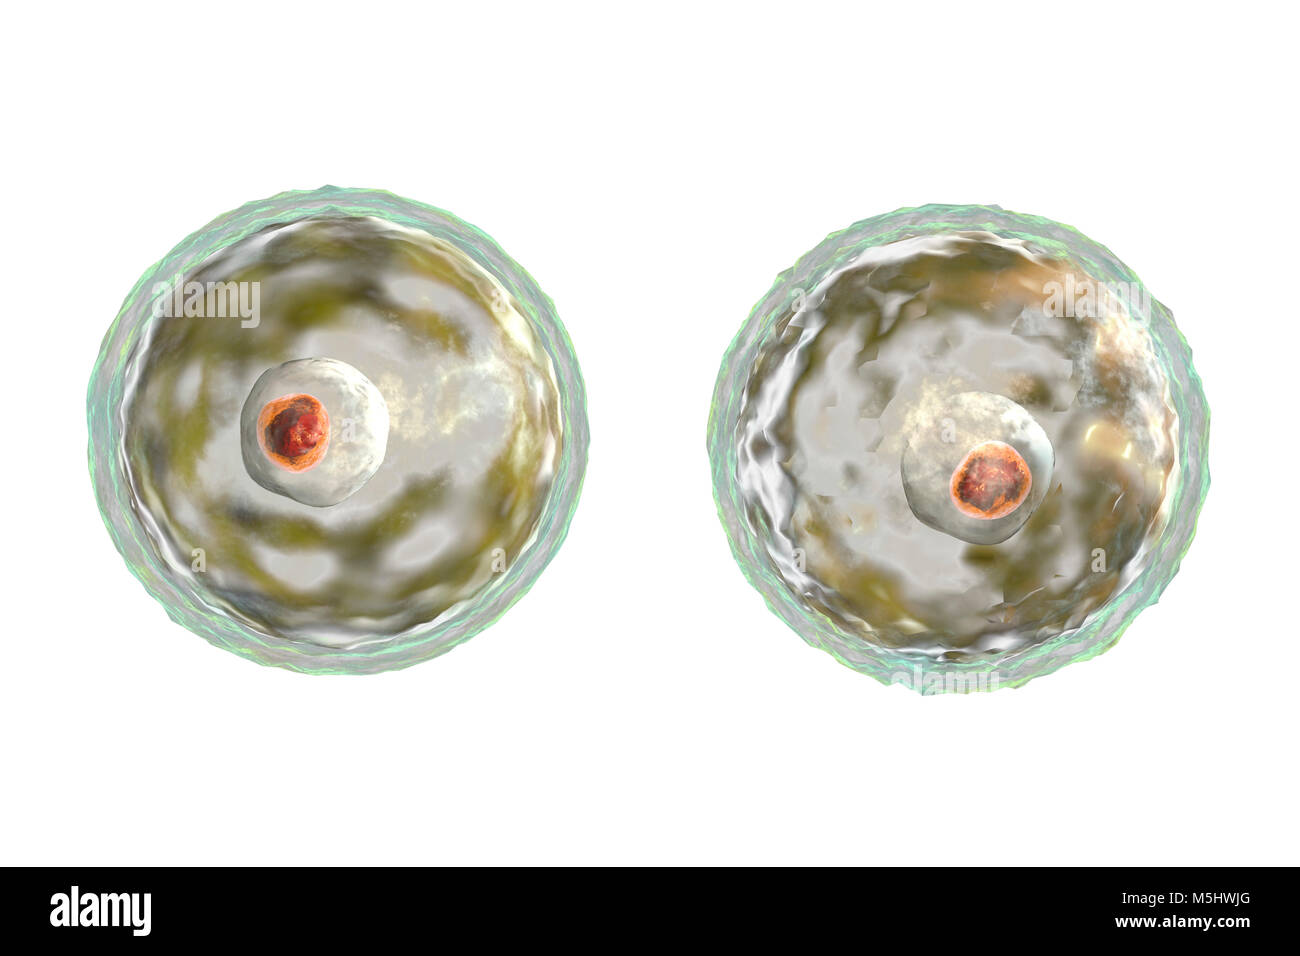 Brain-eating amoeba Naegleria fowleri protozoans in flagellate, trophozite and cyst forms, computer illustration. - Stock Image